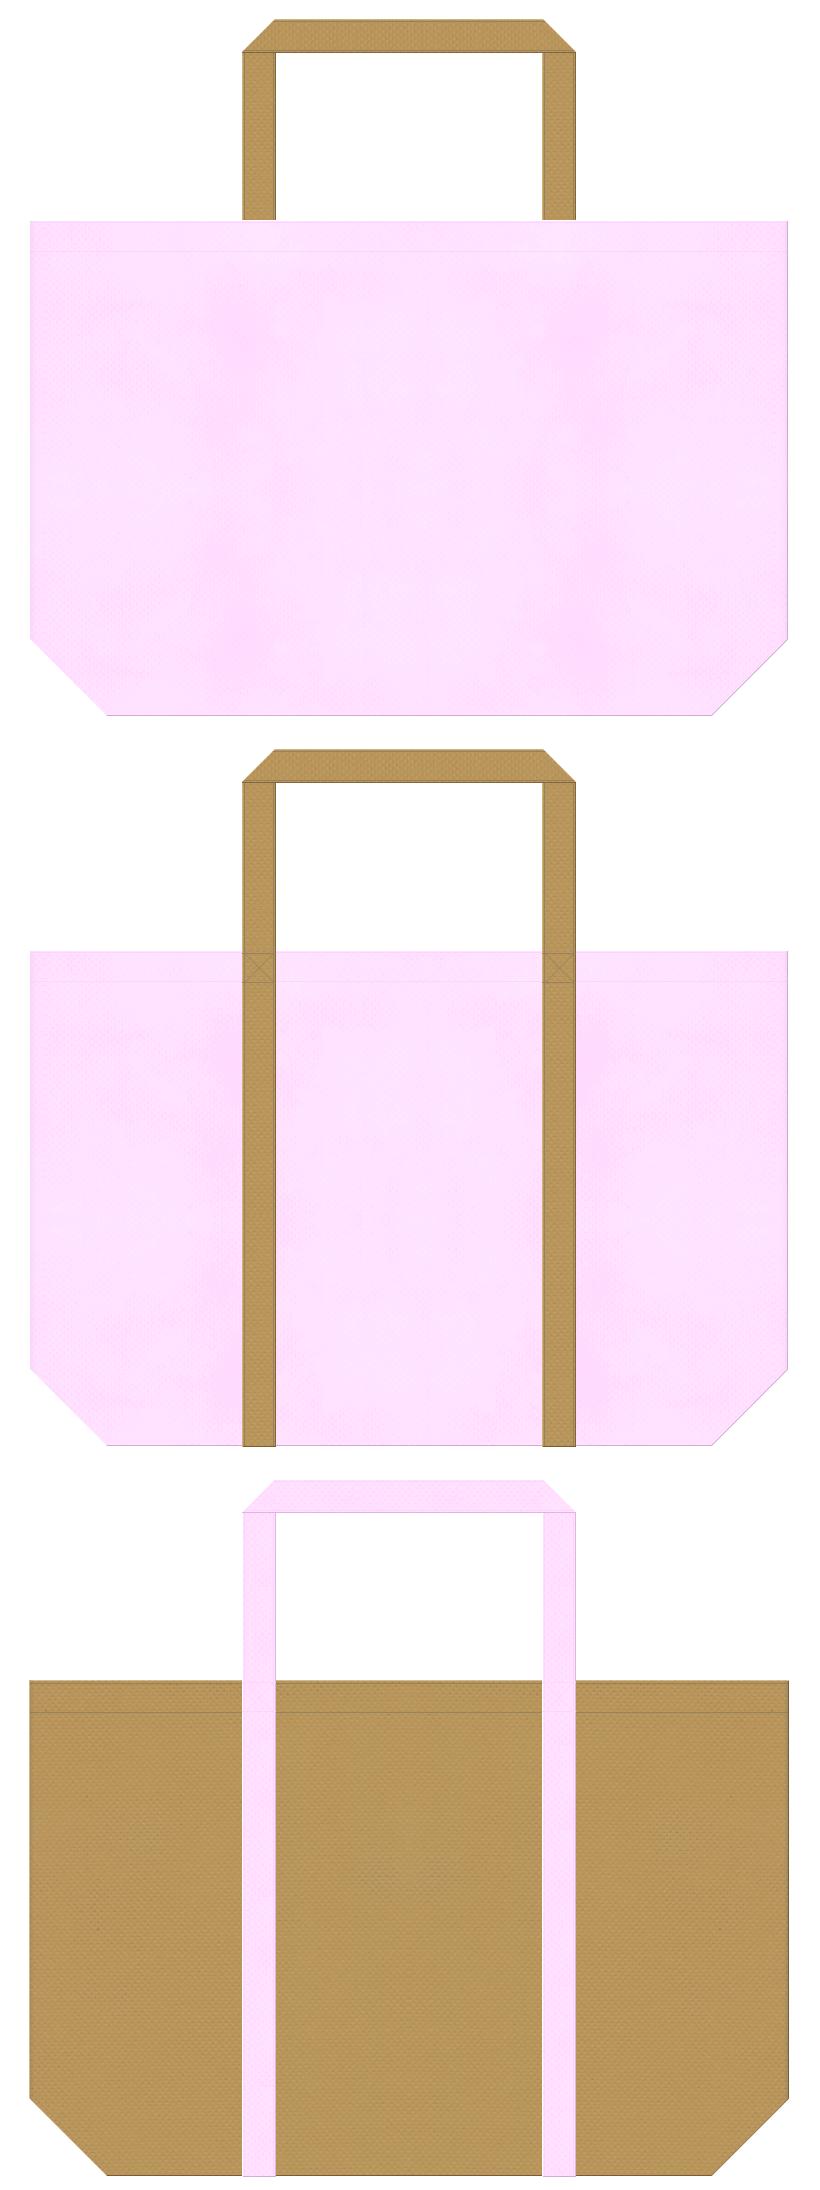 girlyなバッグノベルティにお奨めのコーデ。明るいピンク色と金色系黄土色の不織布バッグデザイン。